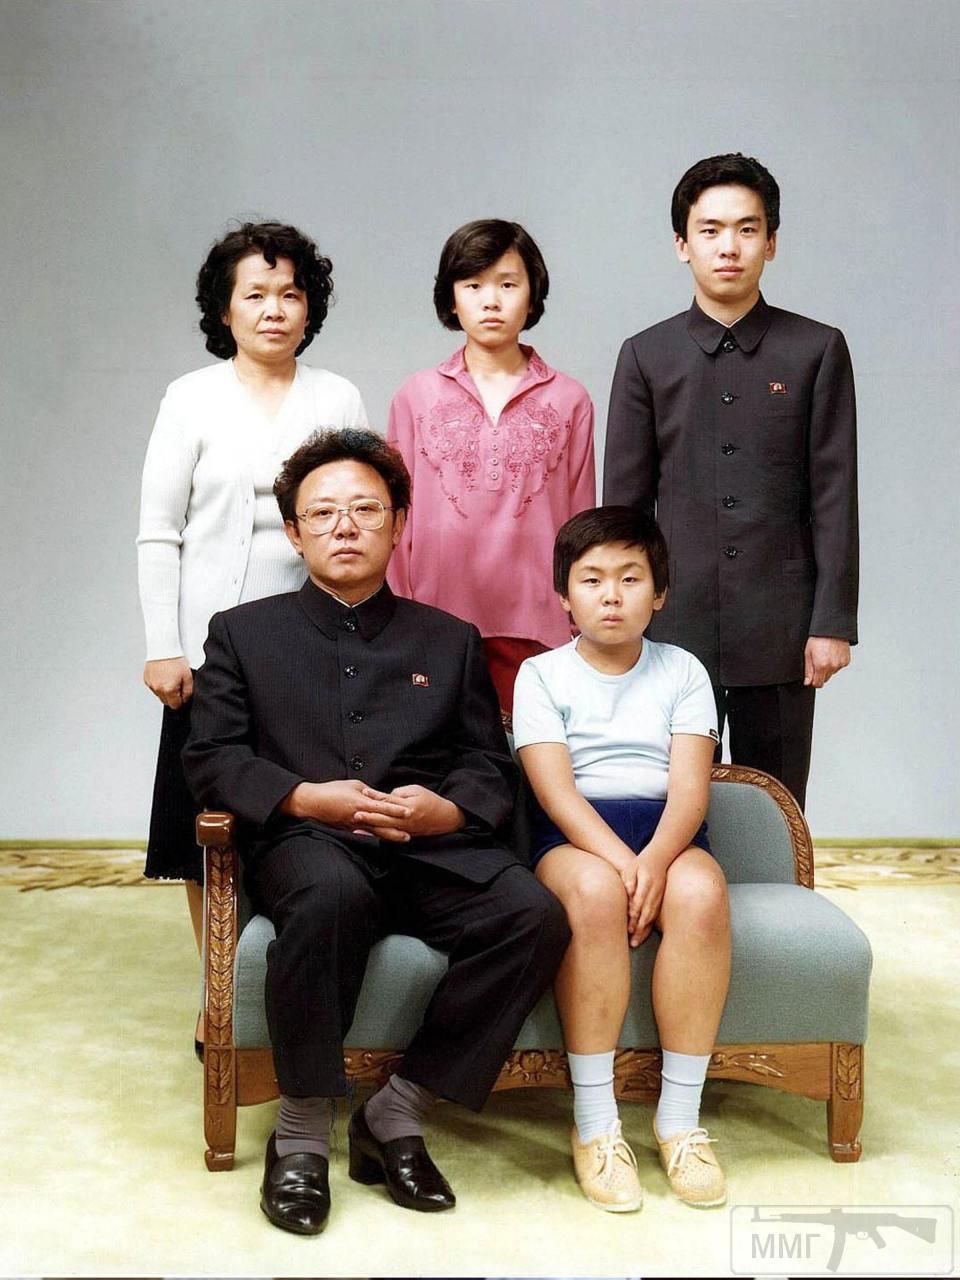 101882 - Северная Корея - реалии